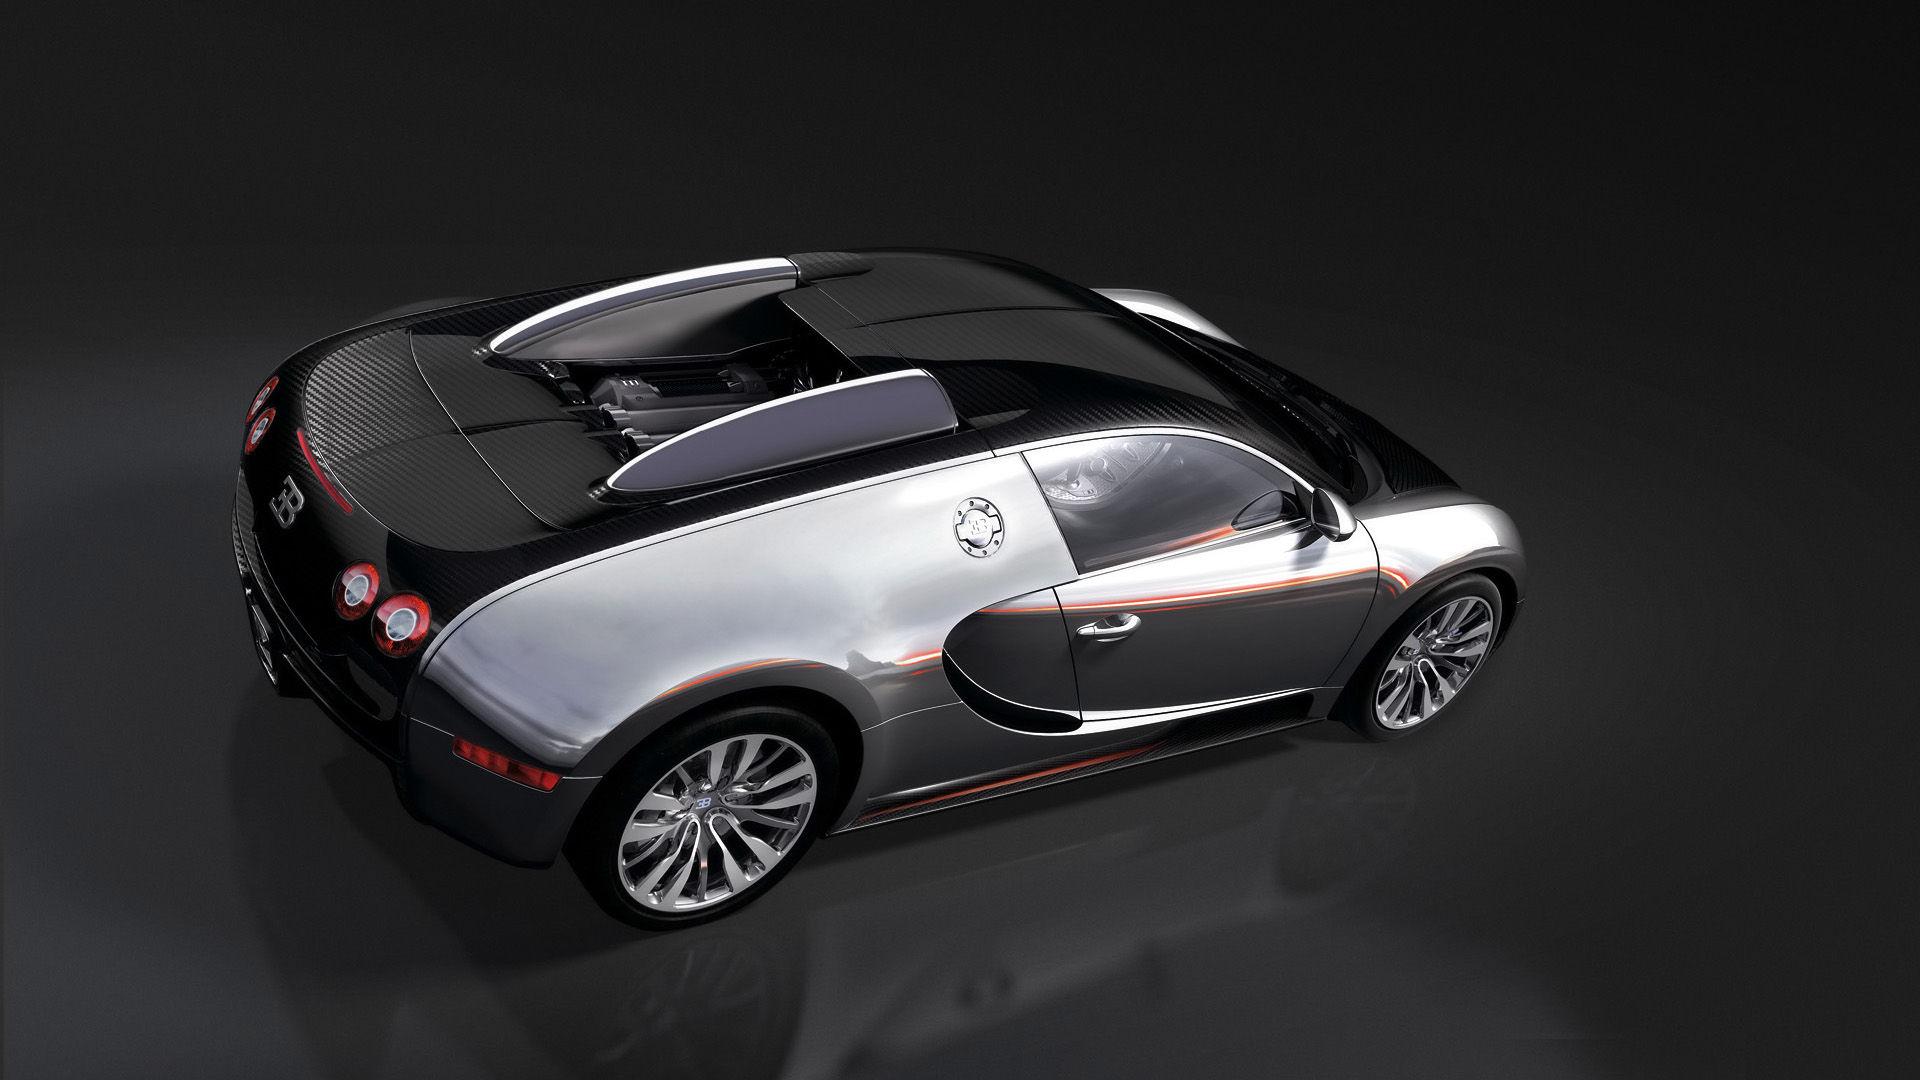 2008 Bugatti Veyron 16-4 Pur Sang